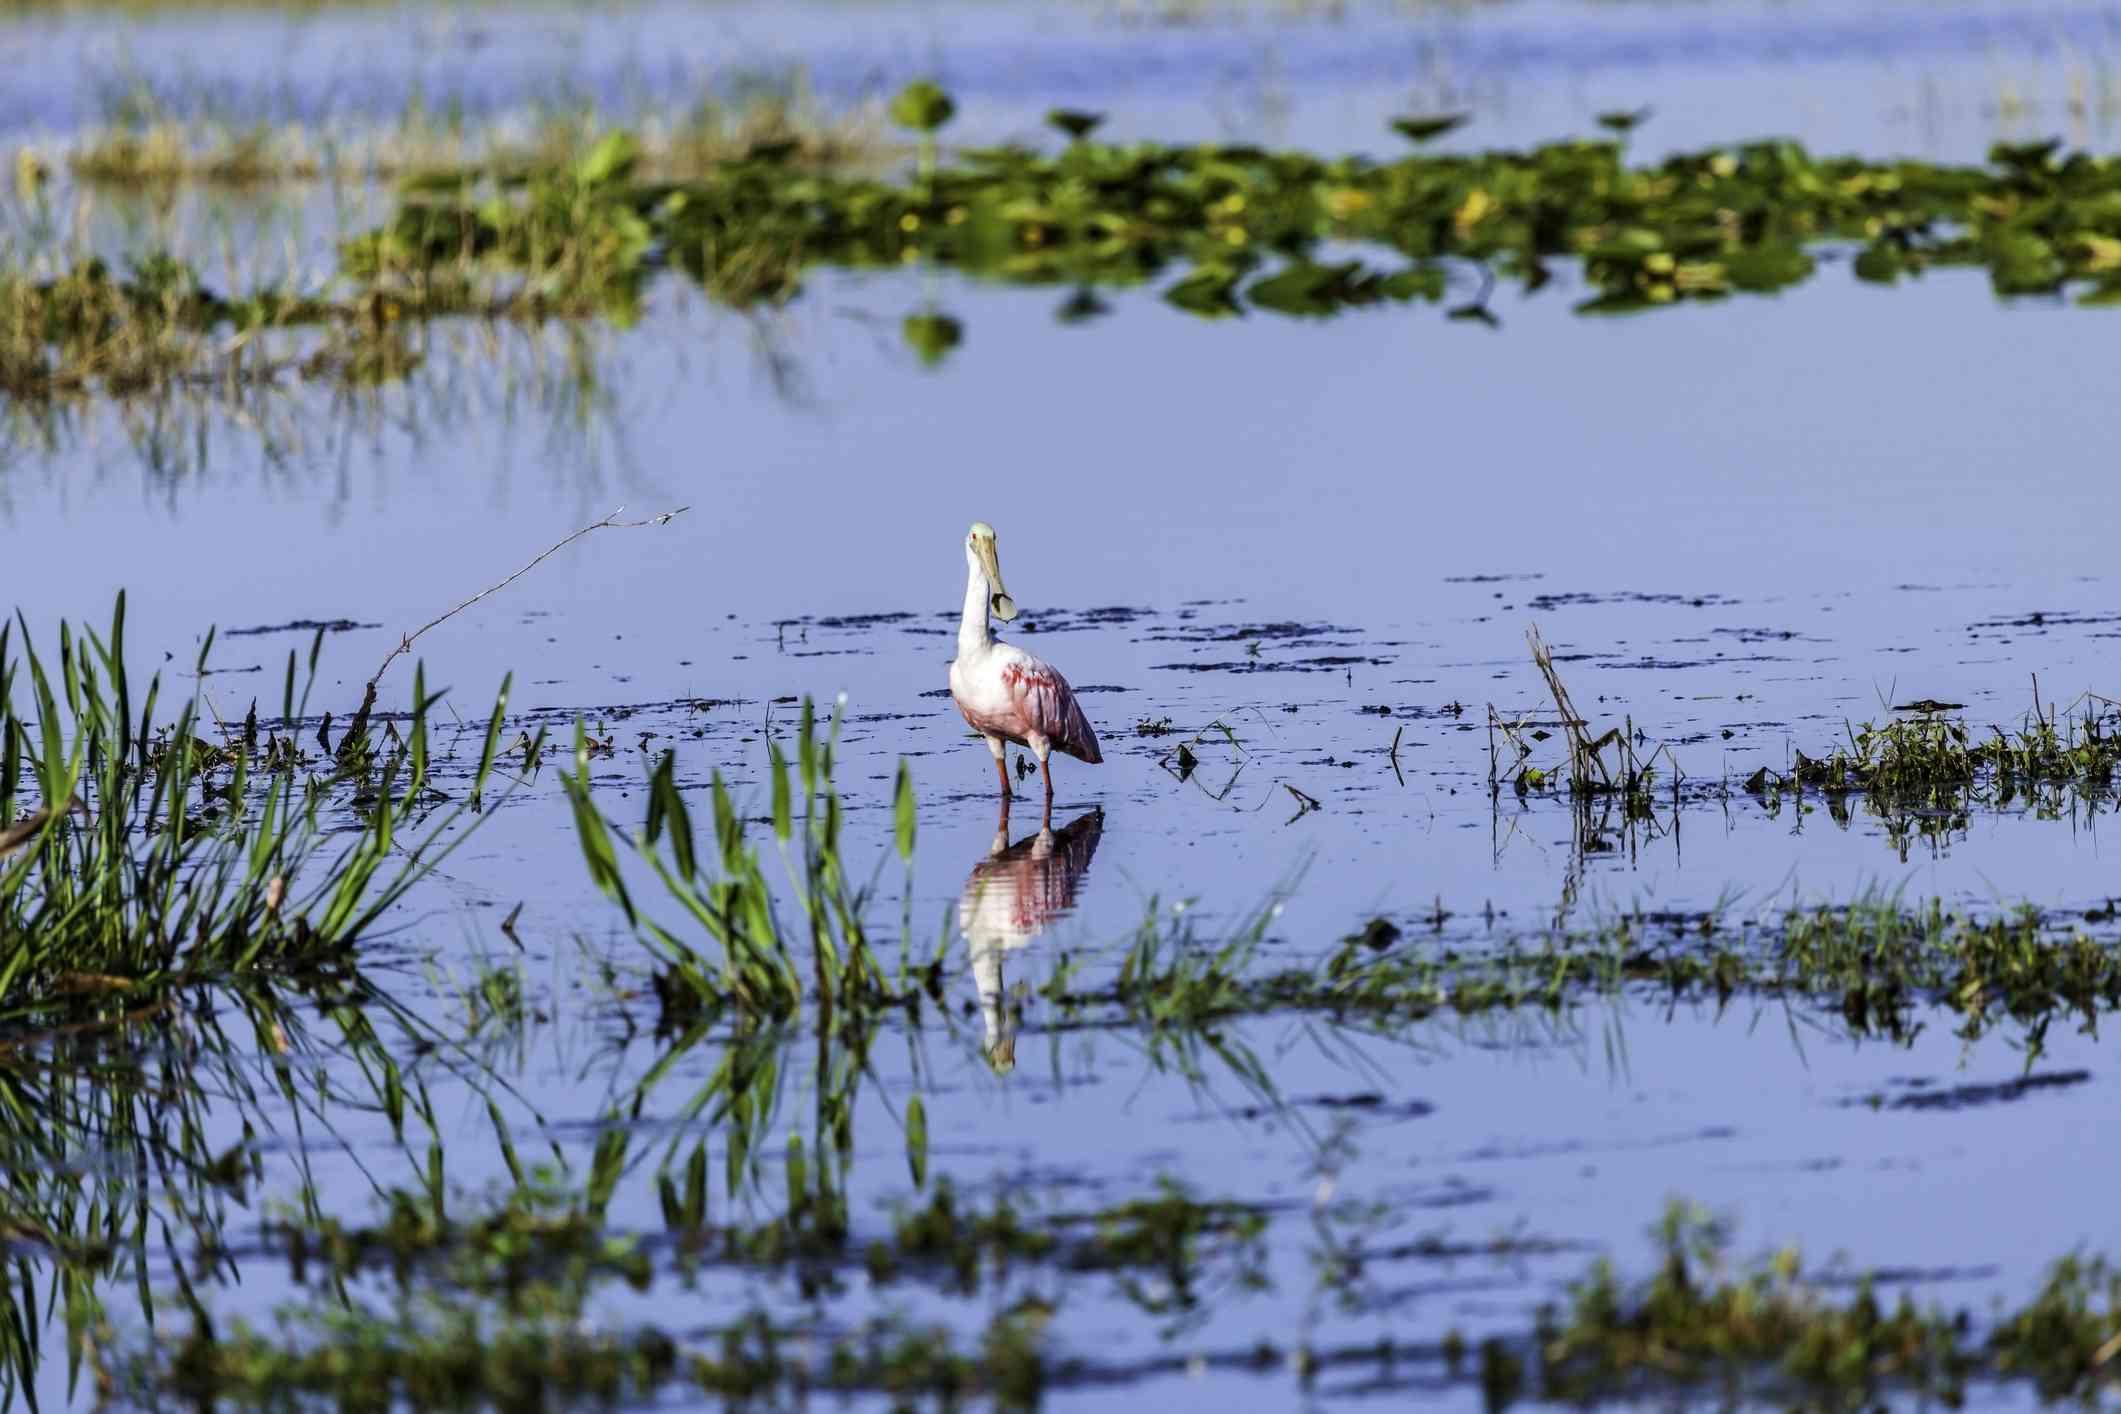 pink roseate spoonbill in the marshes of Merritt Island National Wildlife Refuge